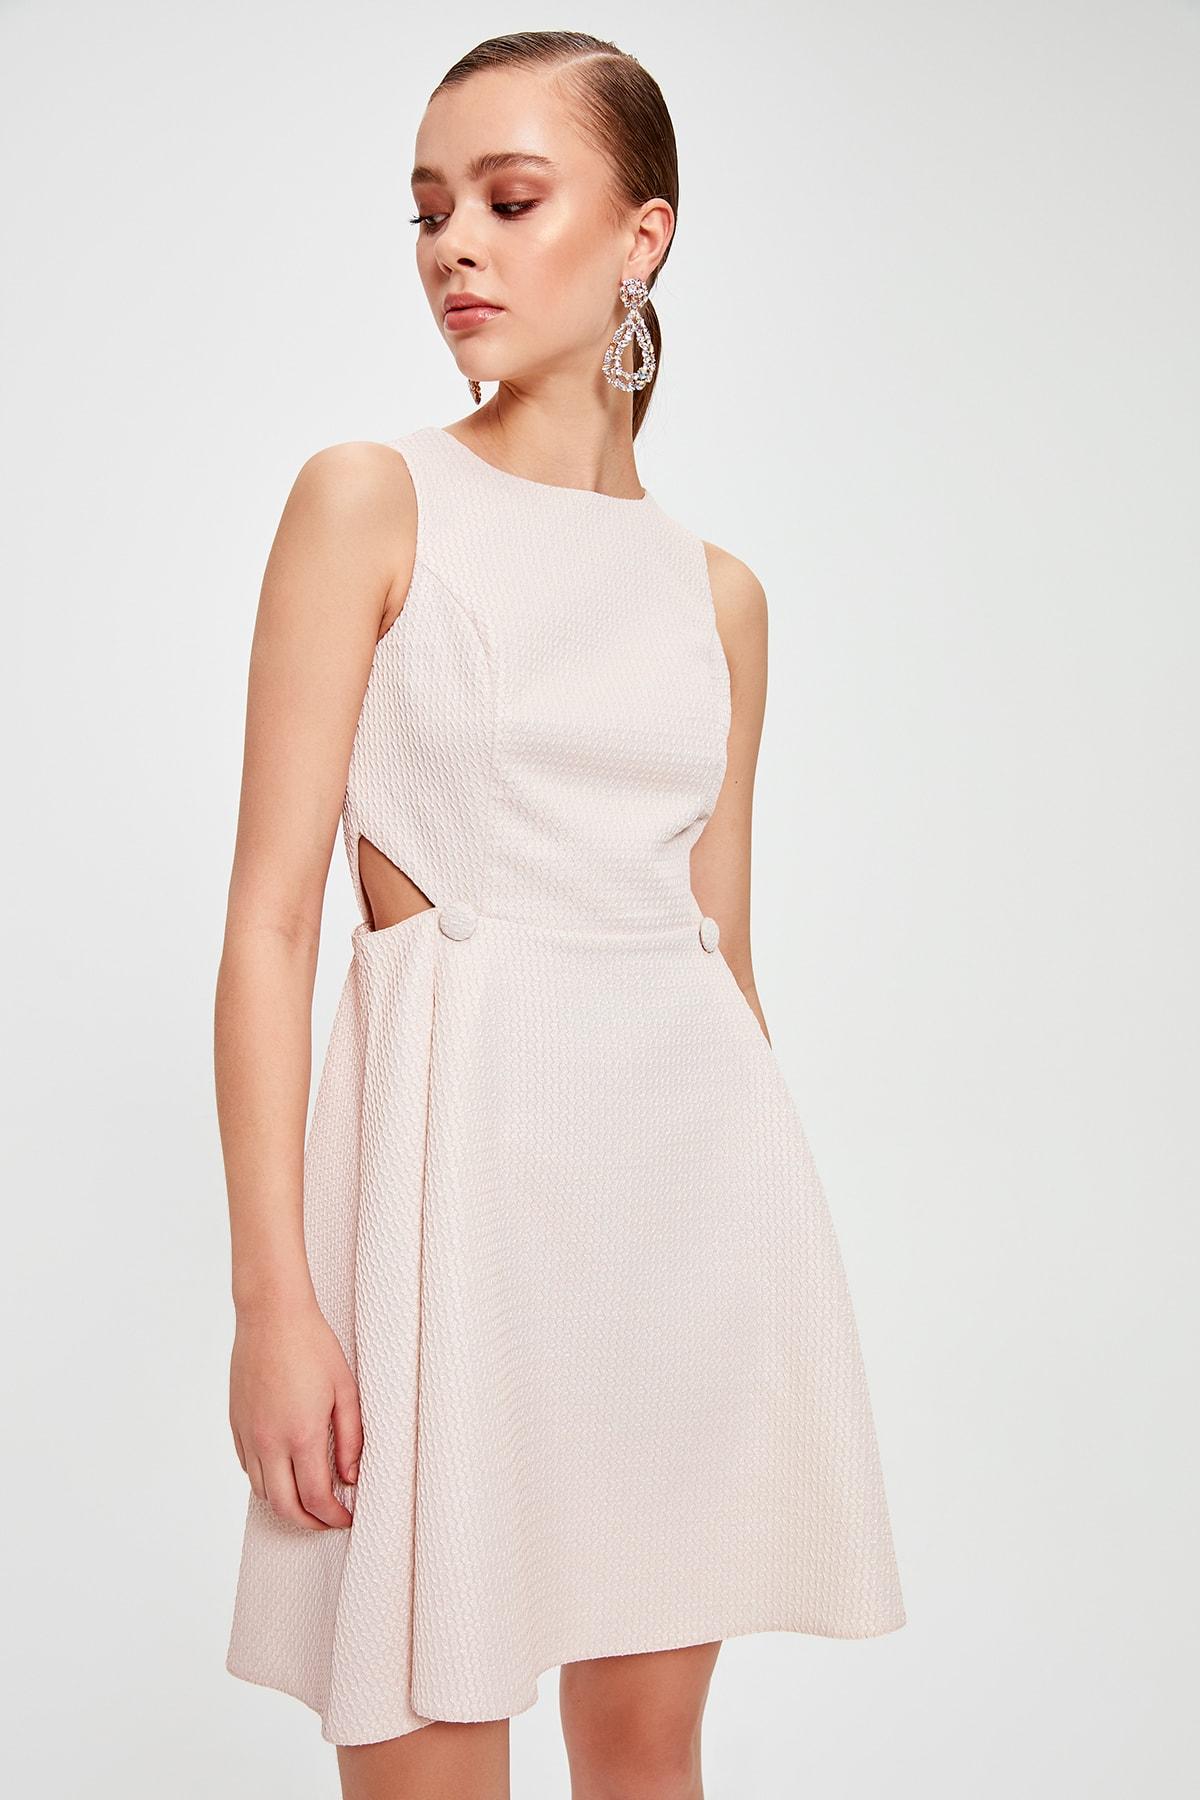 Trendyol Button Detail Dress TPRSS20EL0017()